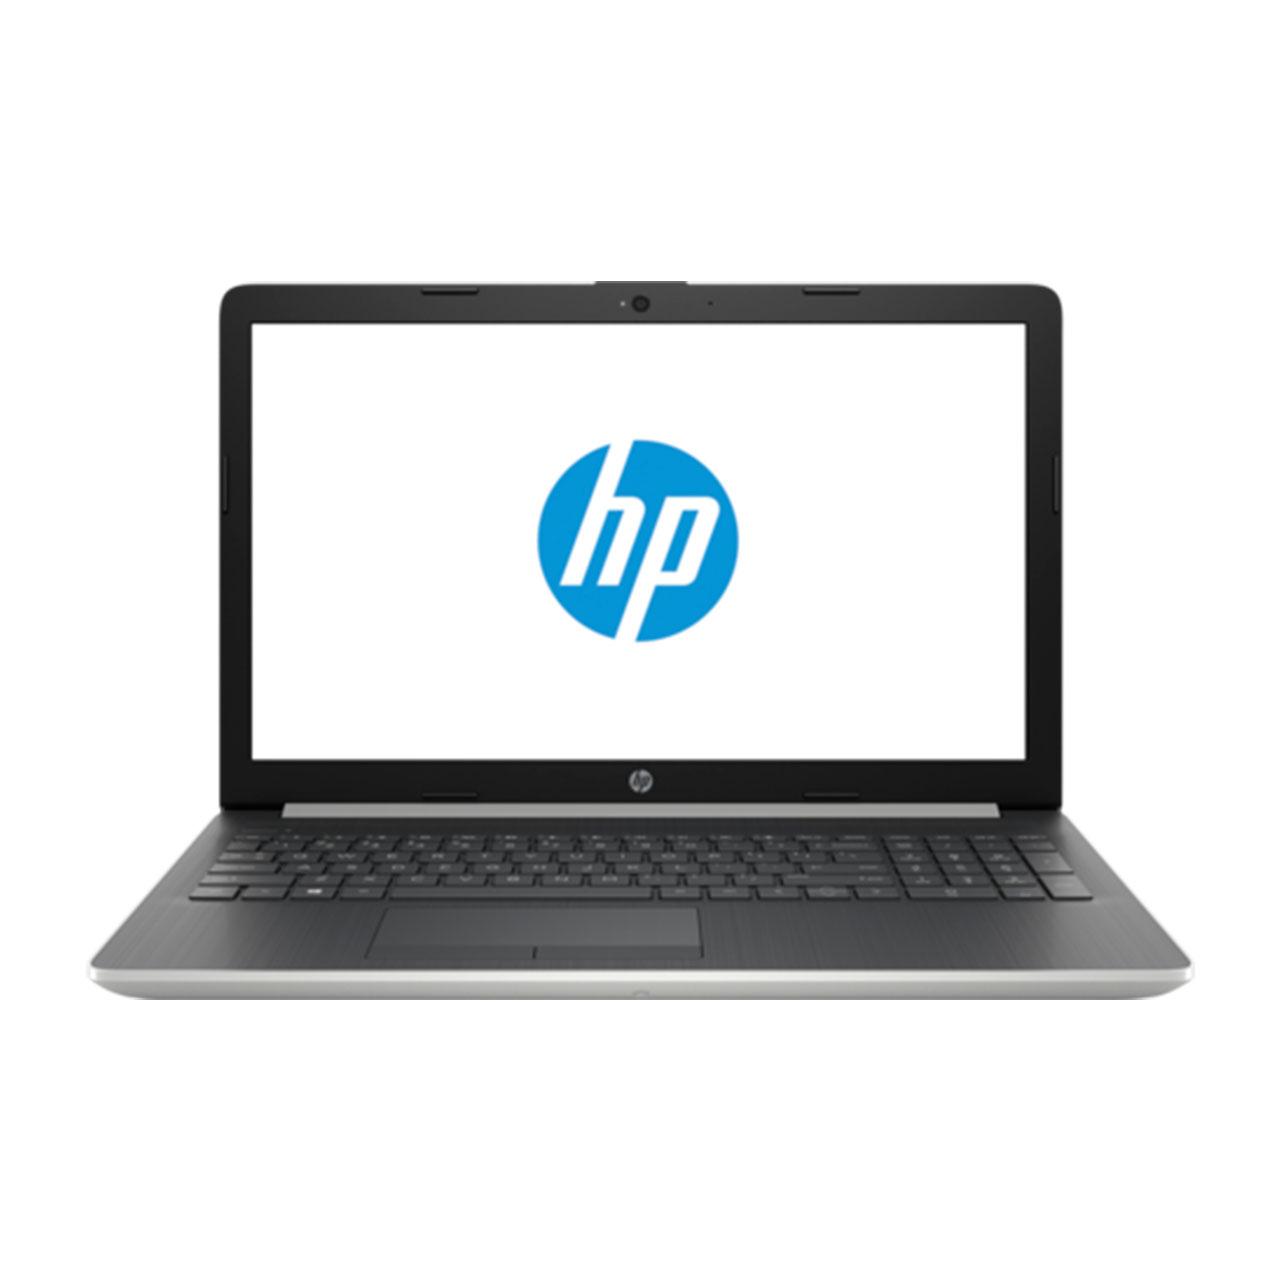 لپ تاپ 15.6 اینچی اچ پی مدل DA0019nia